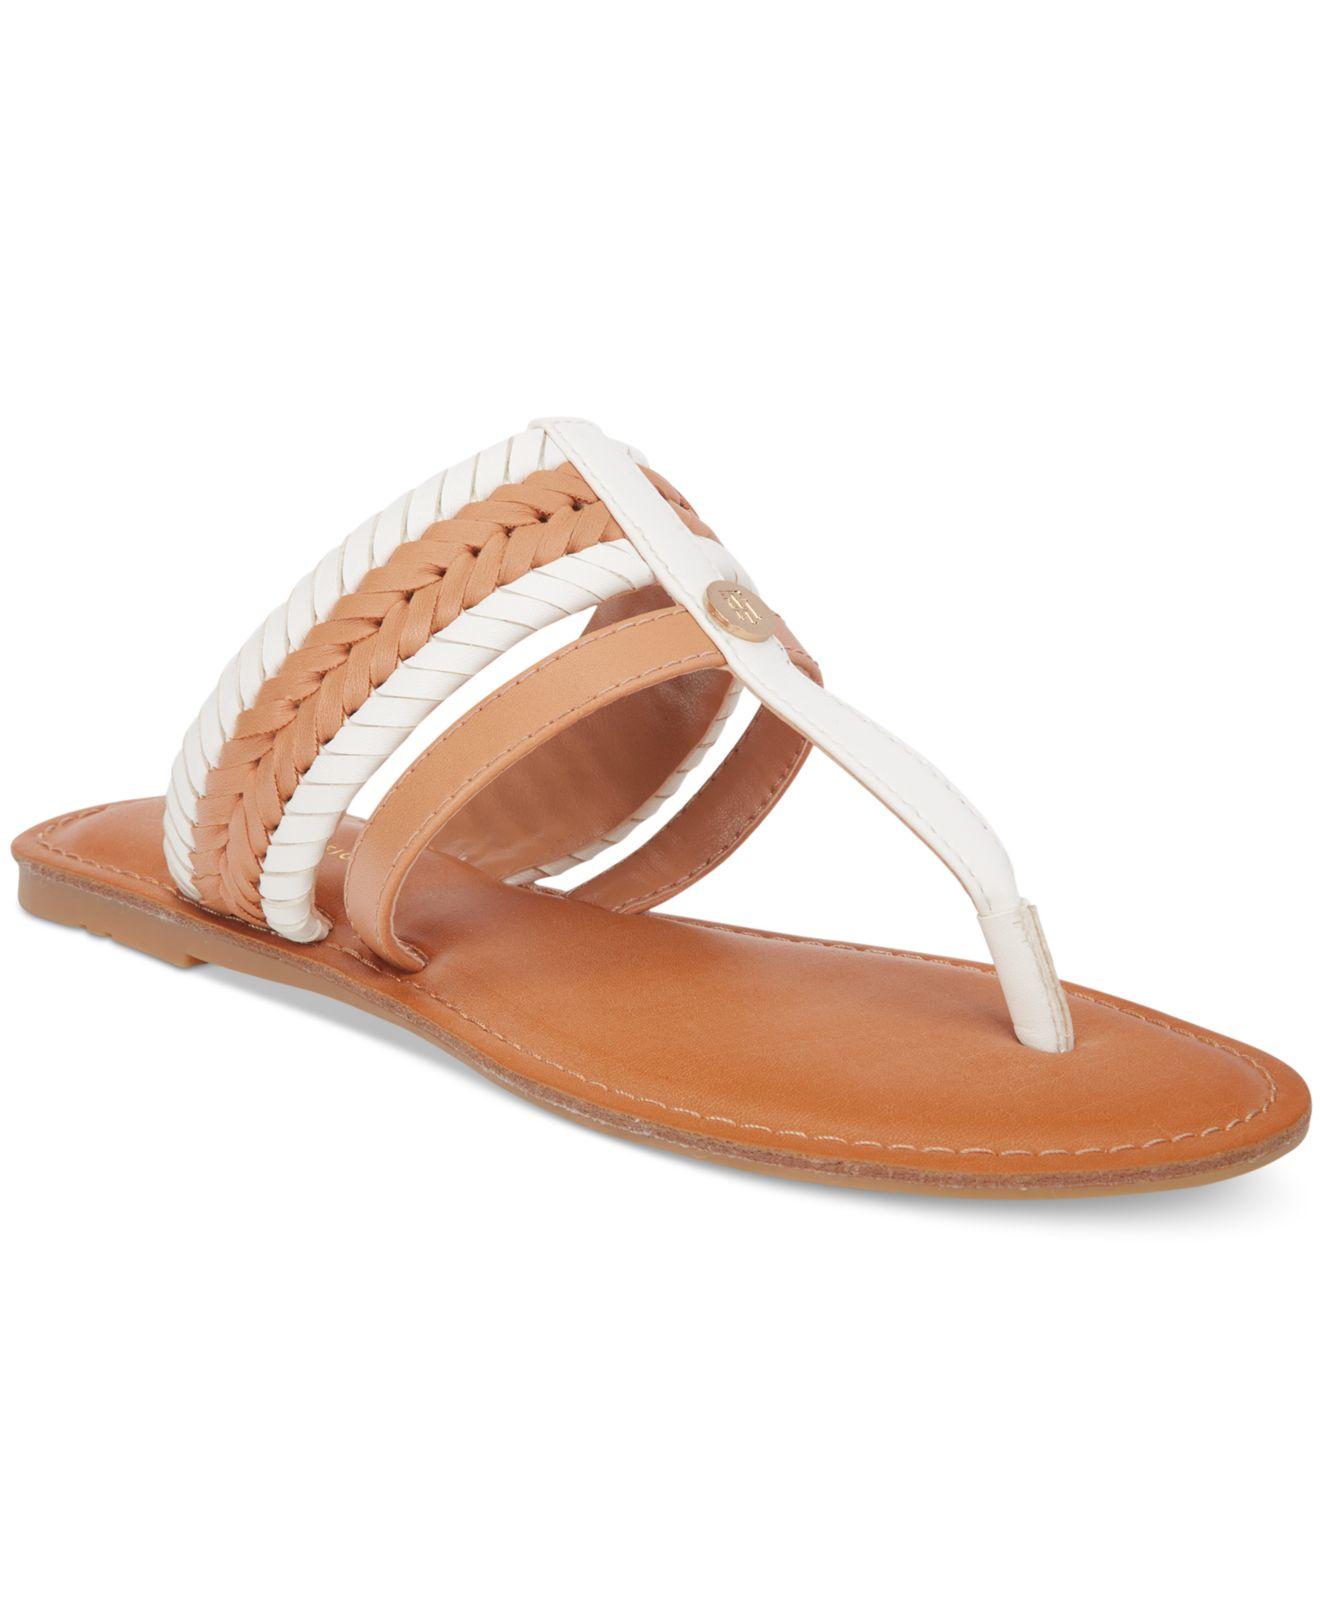 de3f3ed5f9f Lyst - Tommy Hilfiger Lady Flat Thong Sandals in Metallic